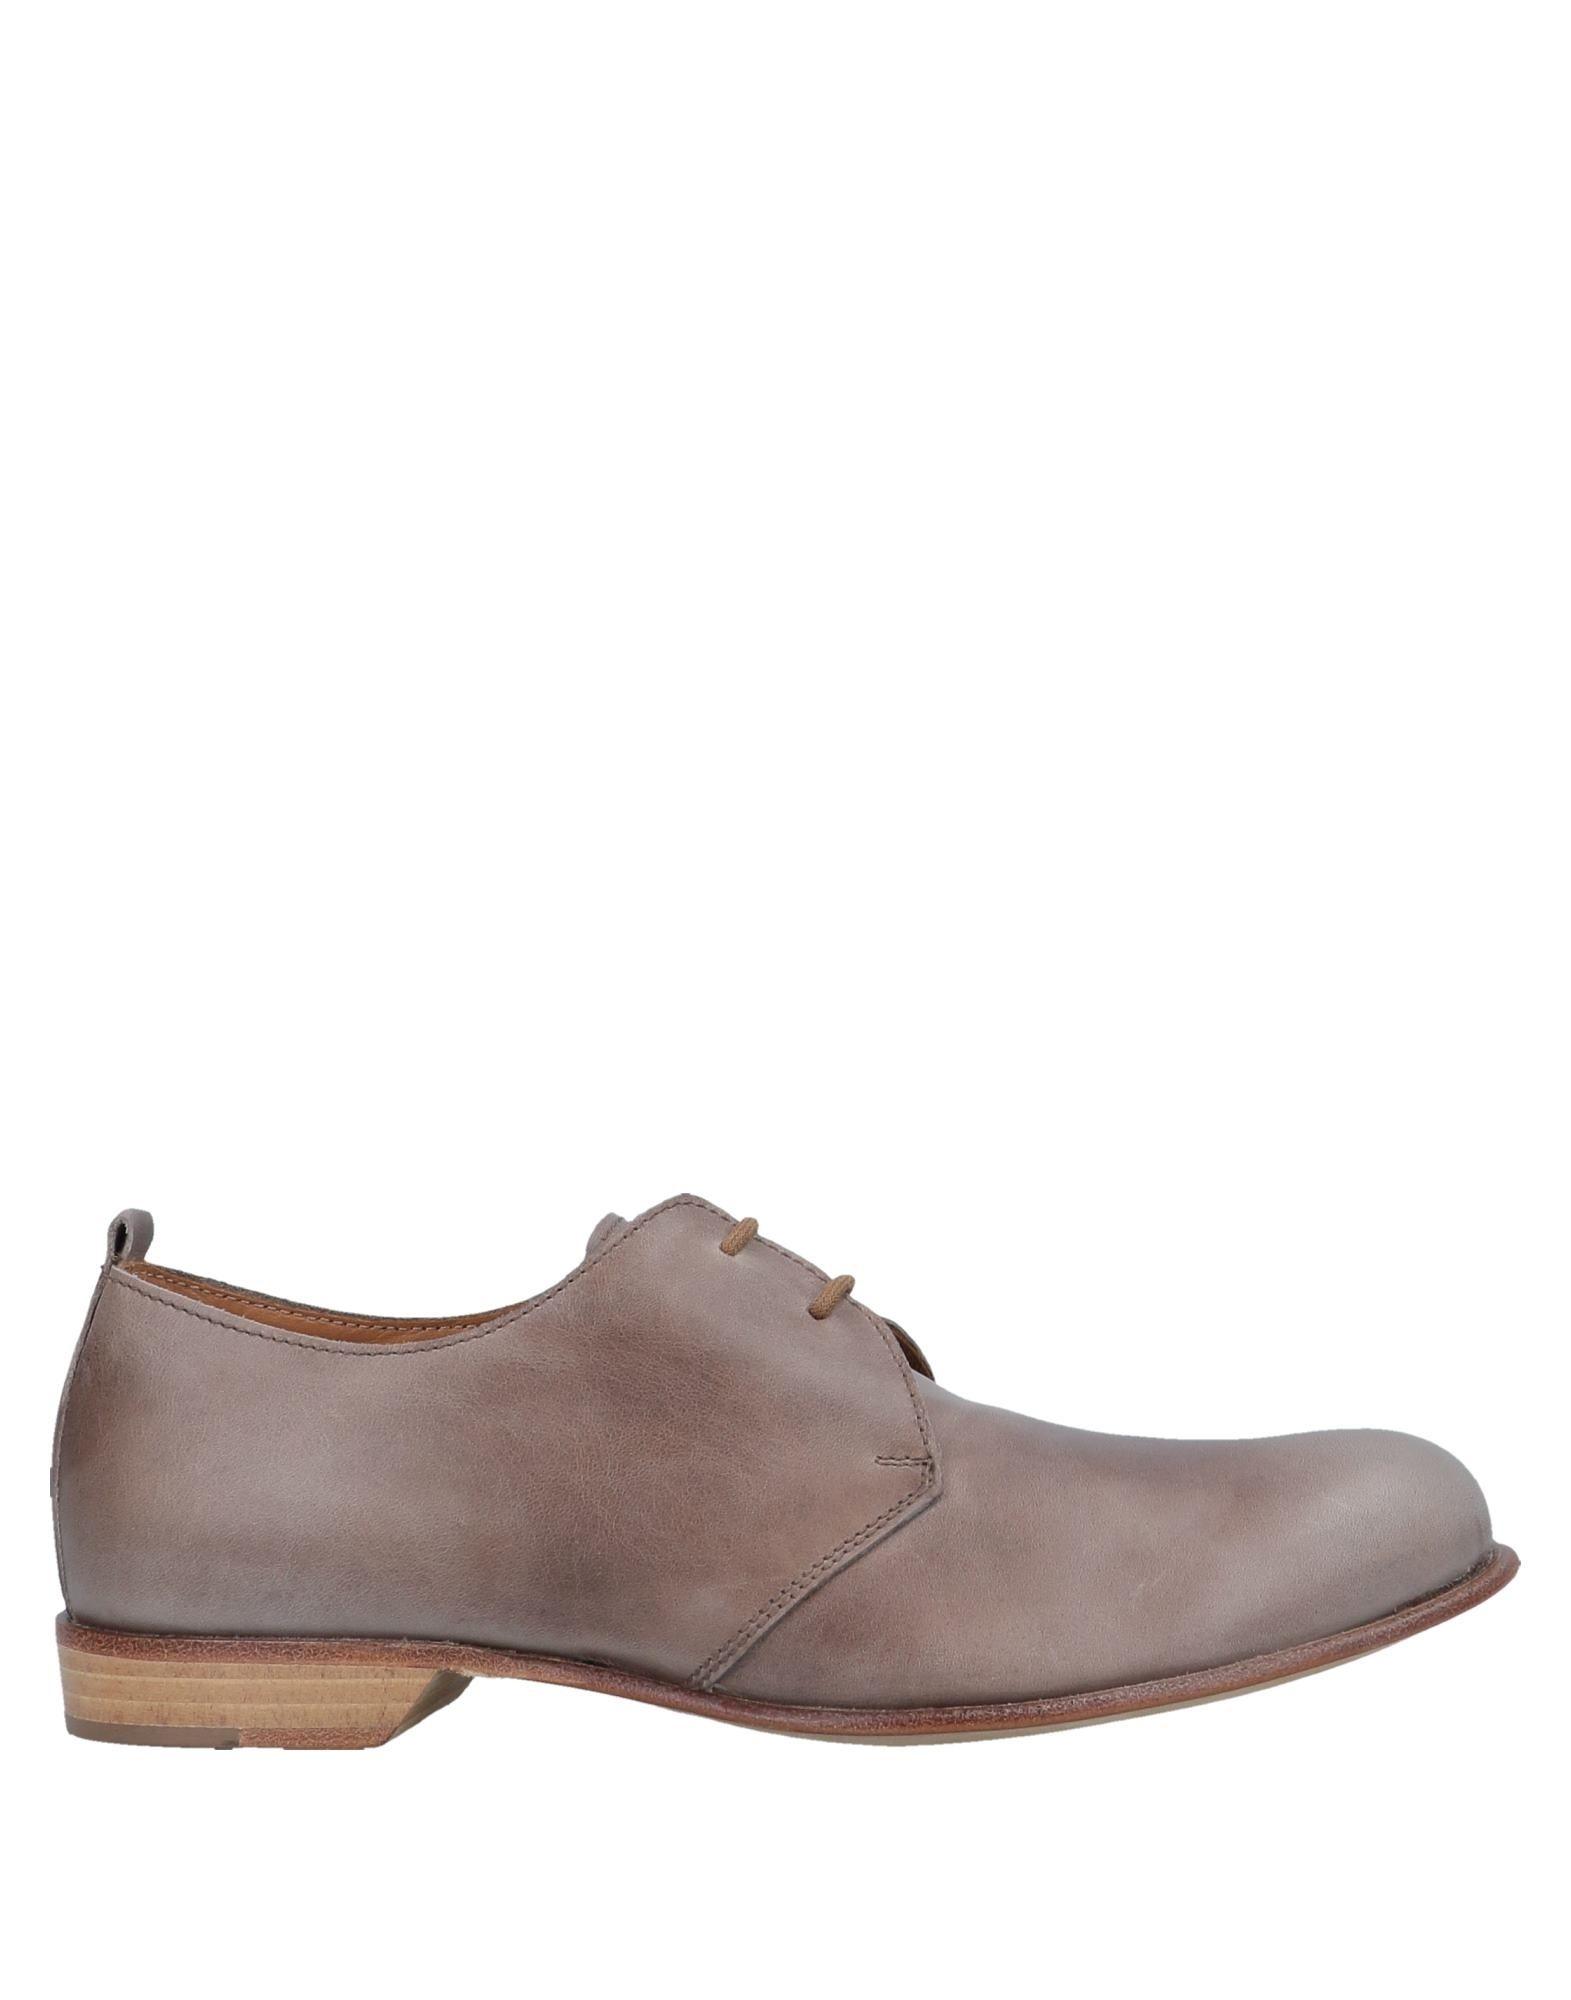 BRUSCHI Обувь на шнурках первый внутри обувь обувь обувь обувь обувь обувь обувь обувь обувь 8a2549 мужская армия green 40 метров